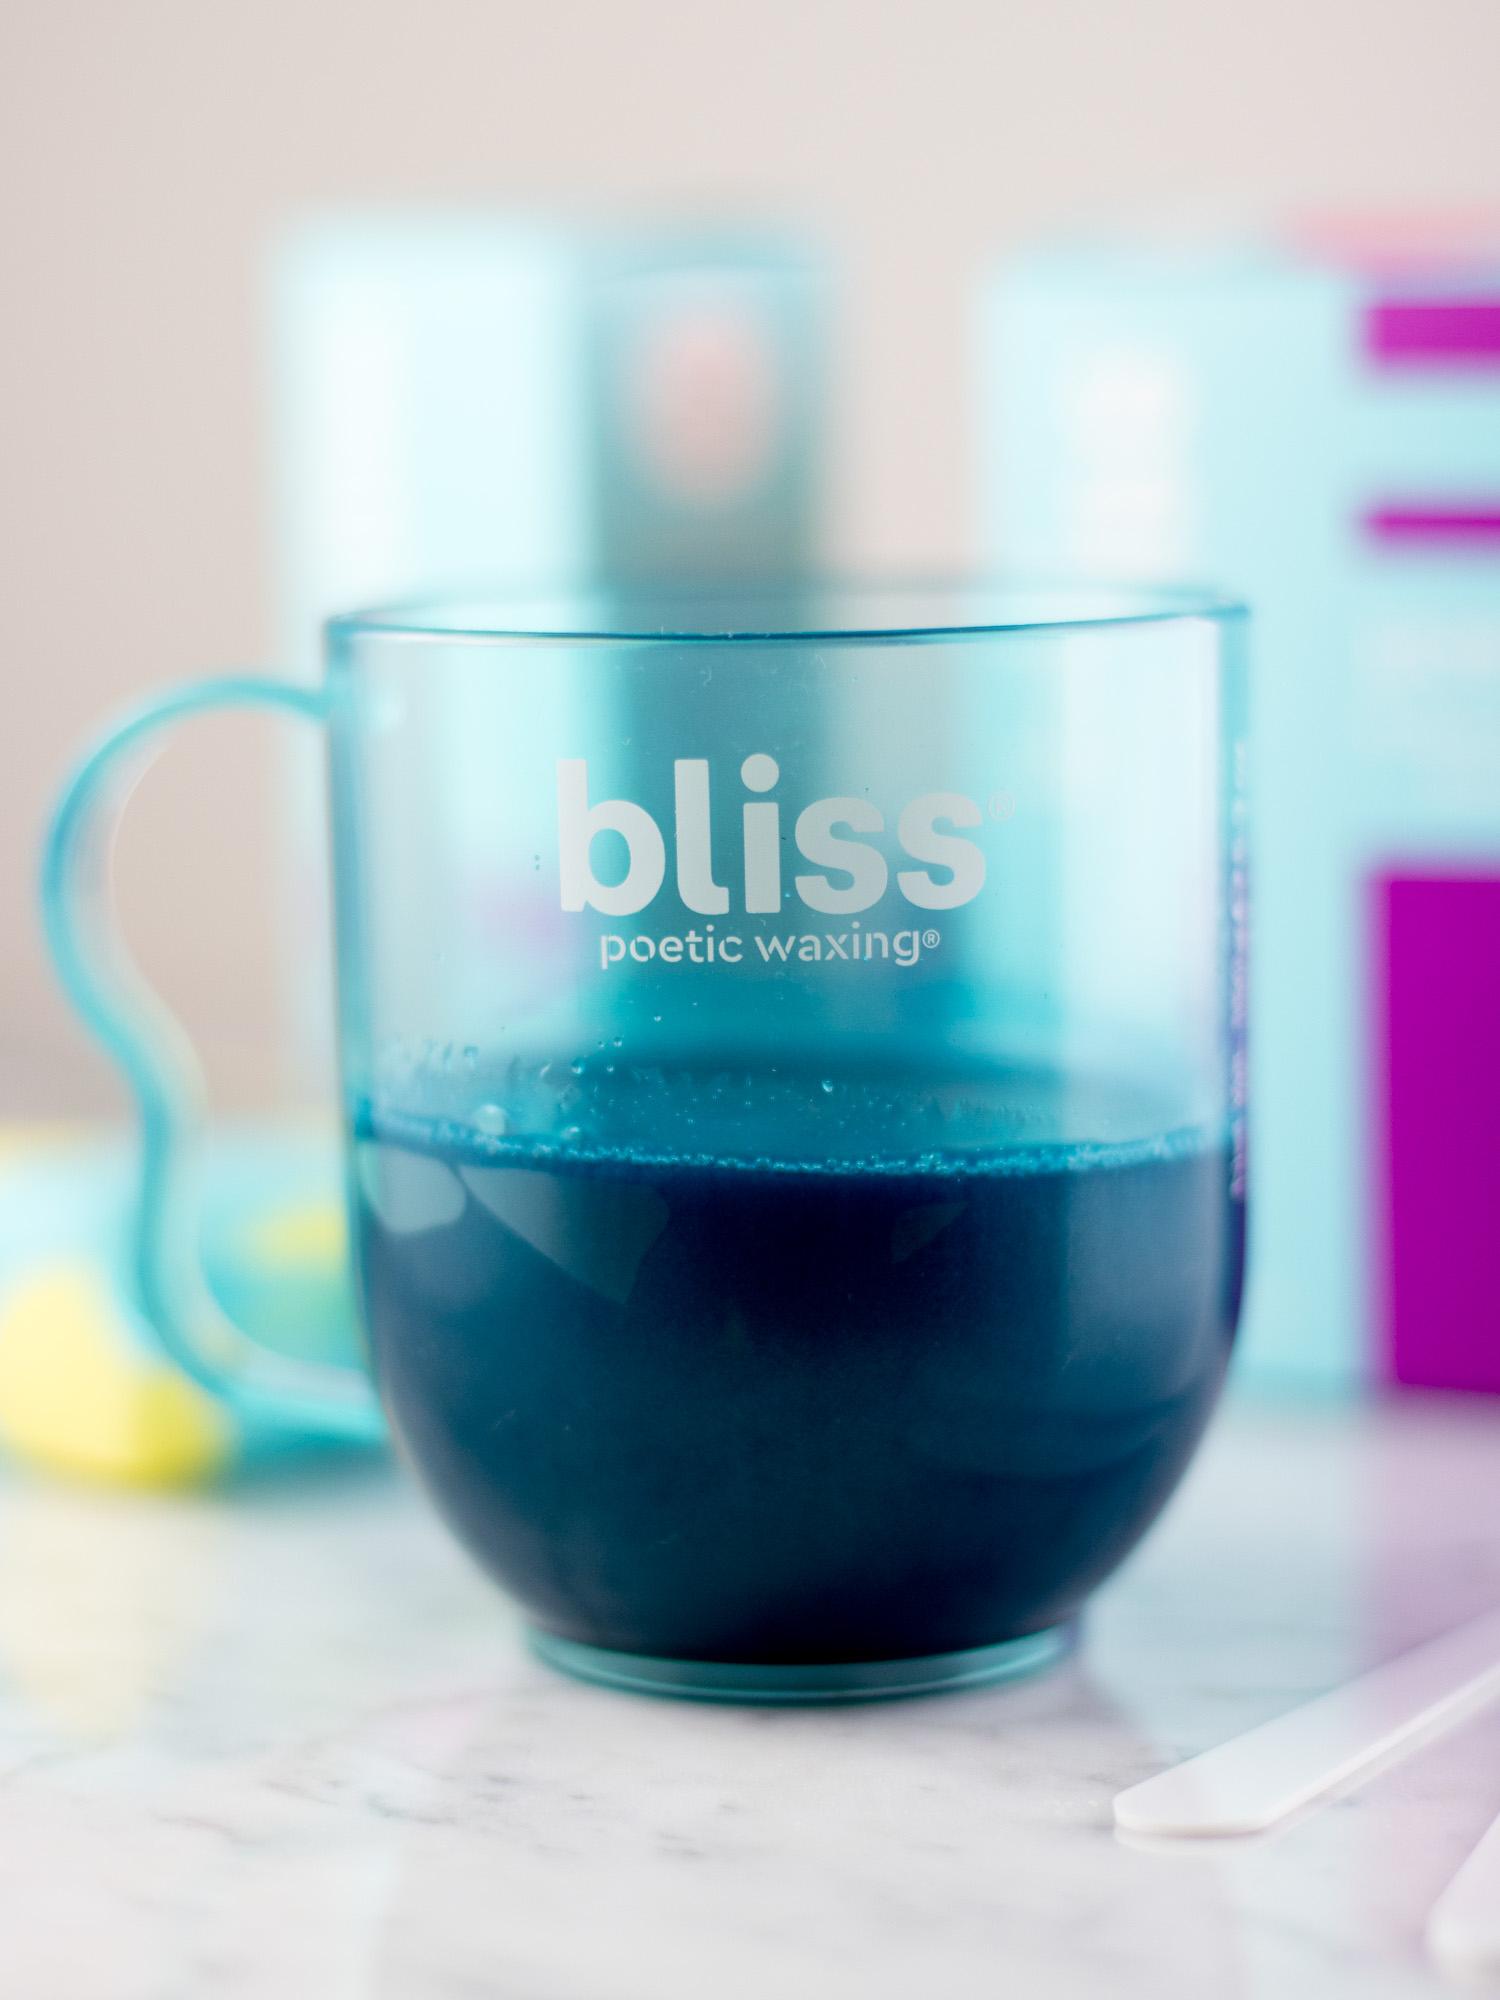 Bliss Poetic Waxing Hair Removal Kit